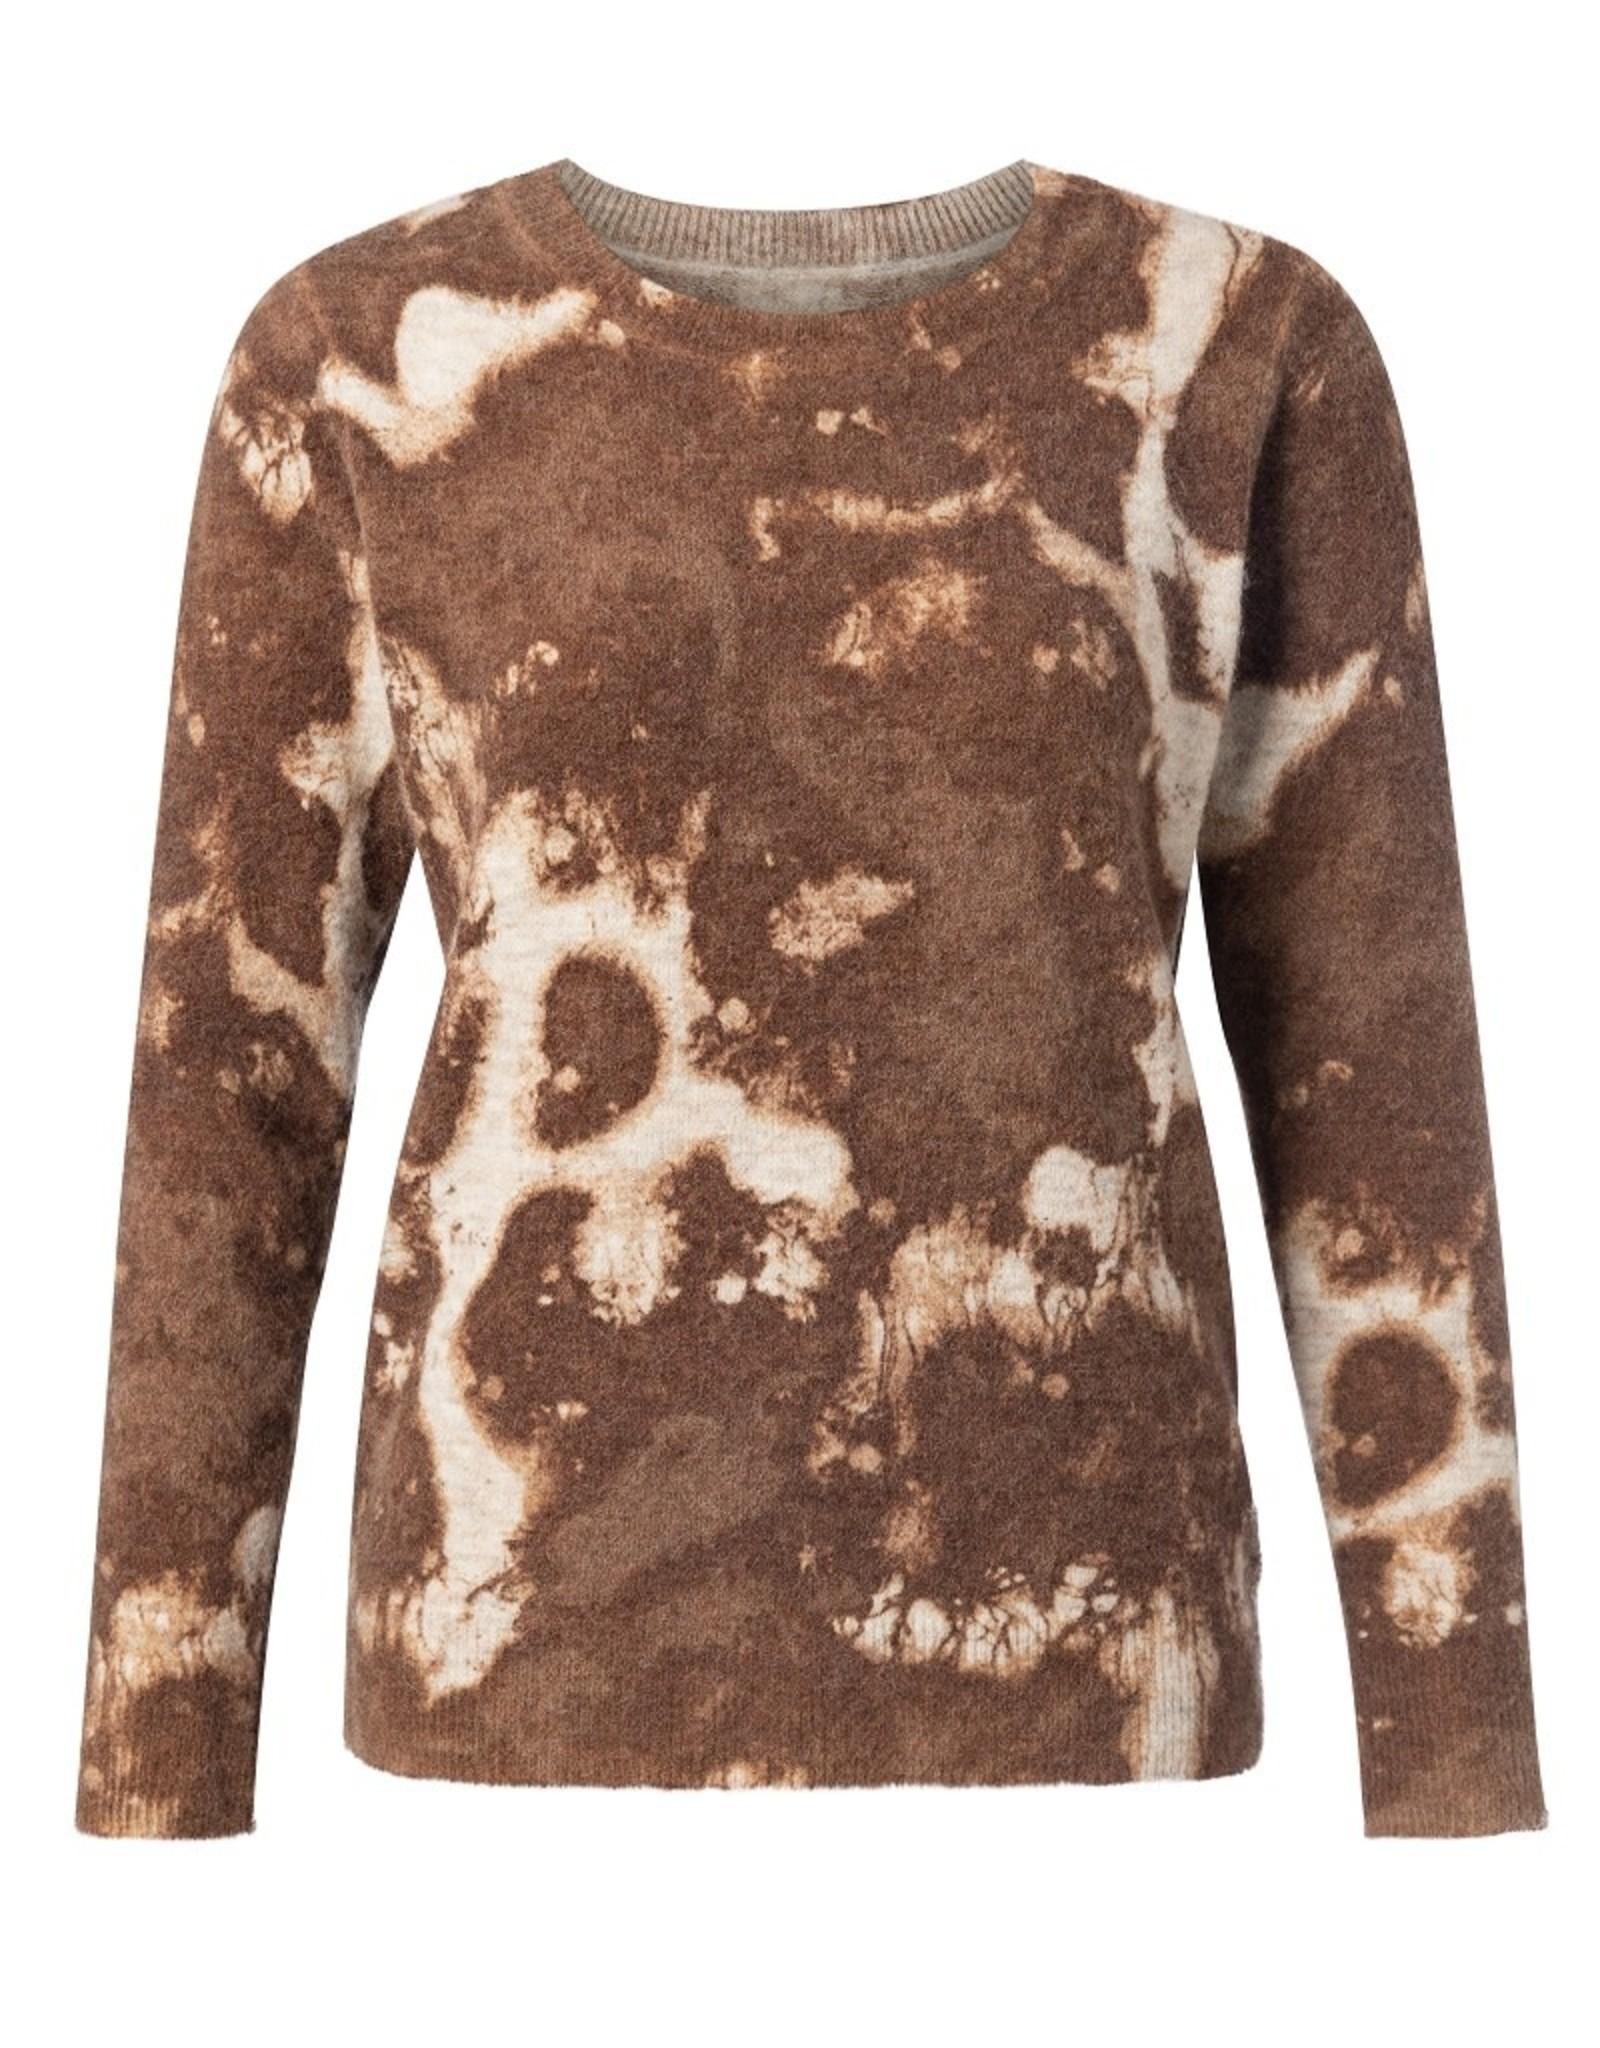 Yaya YAYA Alpaca blend round neck sweater inside out print Beige melange dessin